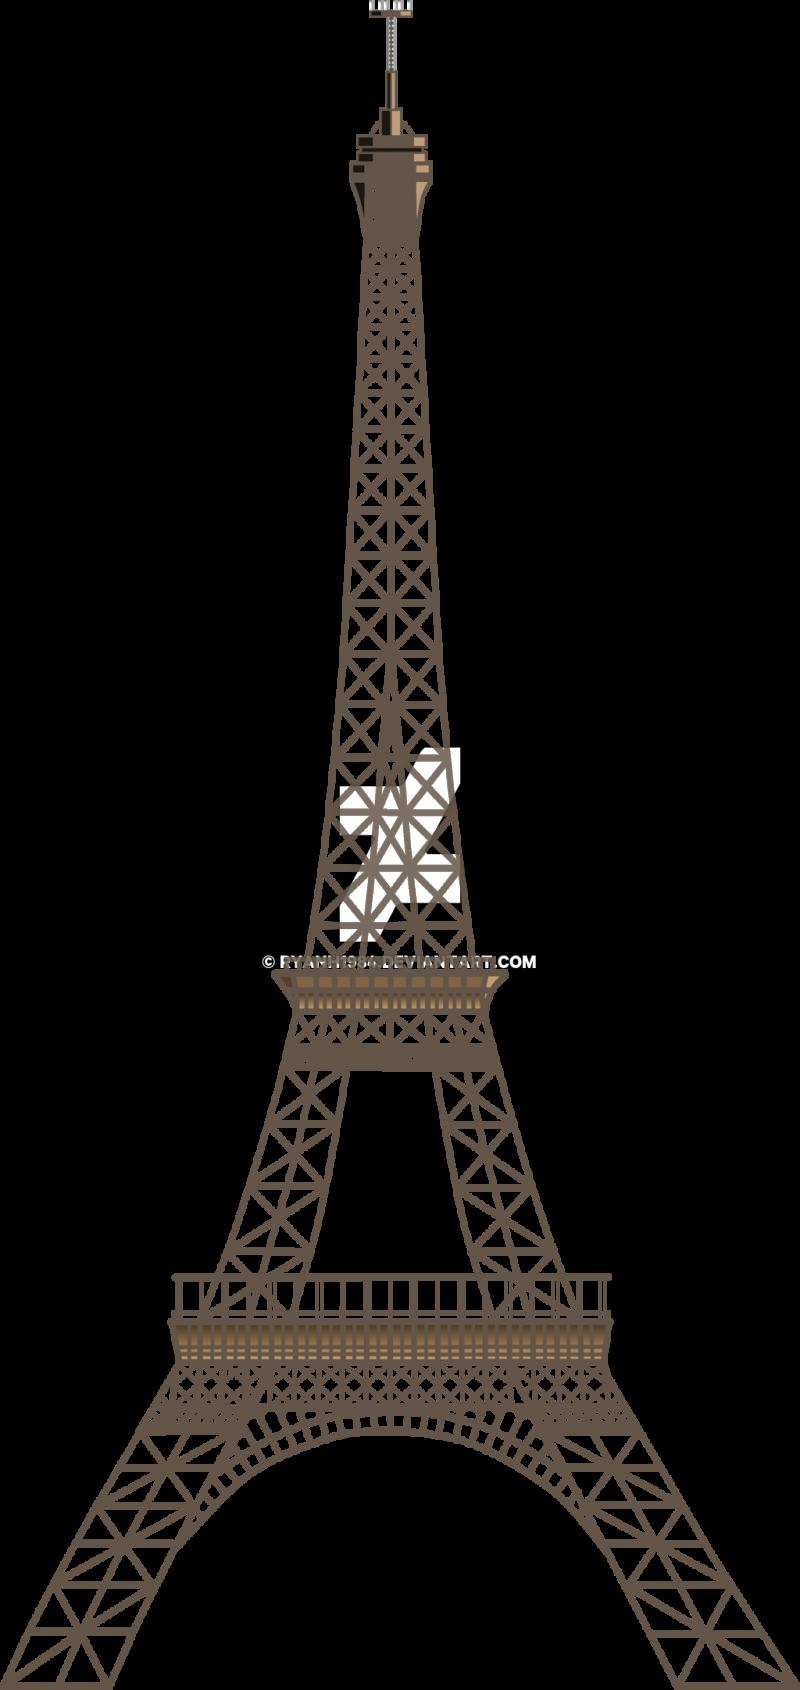 Two Dimensional Eiffel Tower - Paris PNG Image